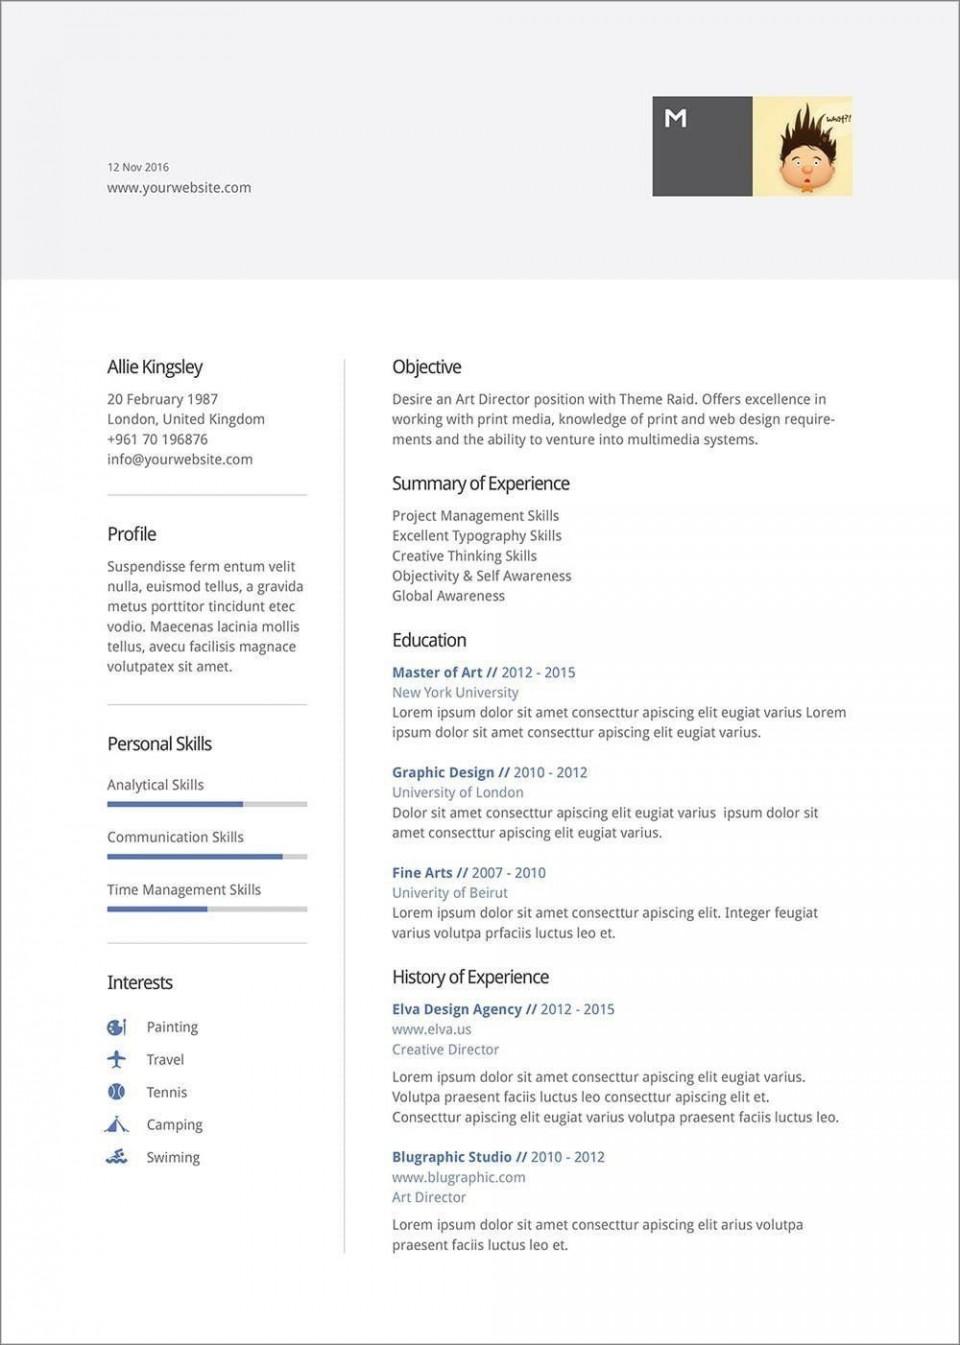 007 Unique Resume Template Word 2016 Design  Cv Microsoft Download Free960